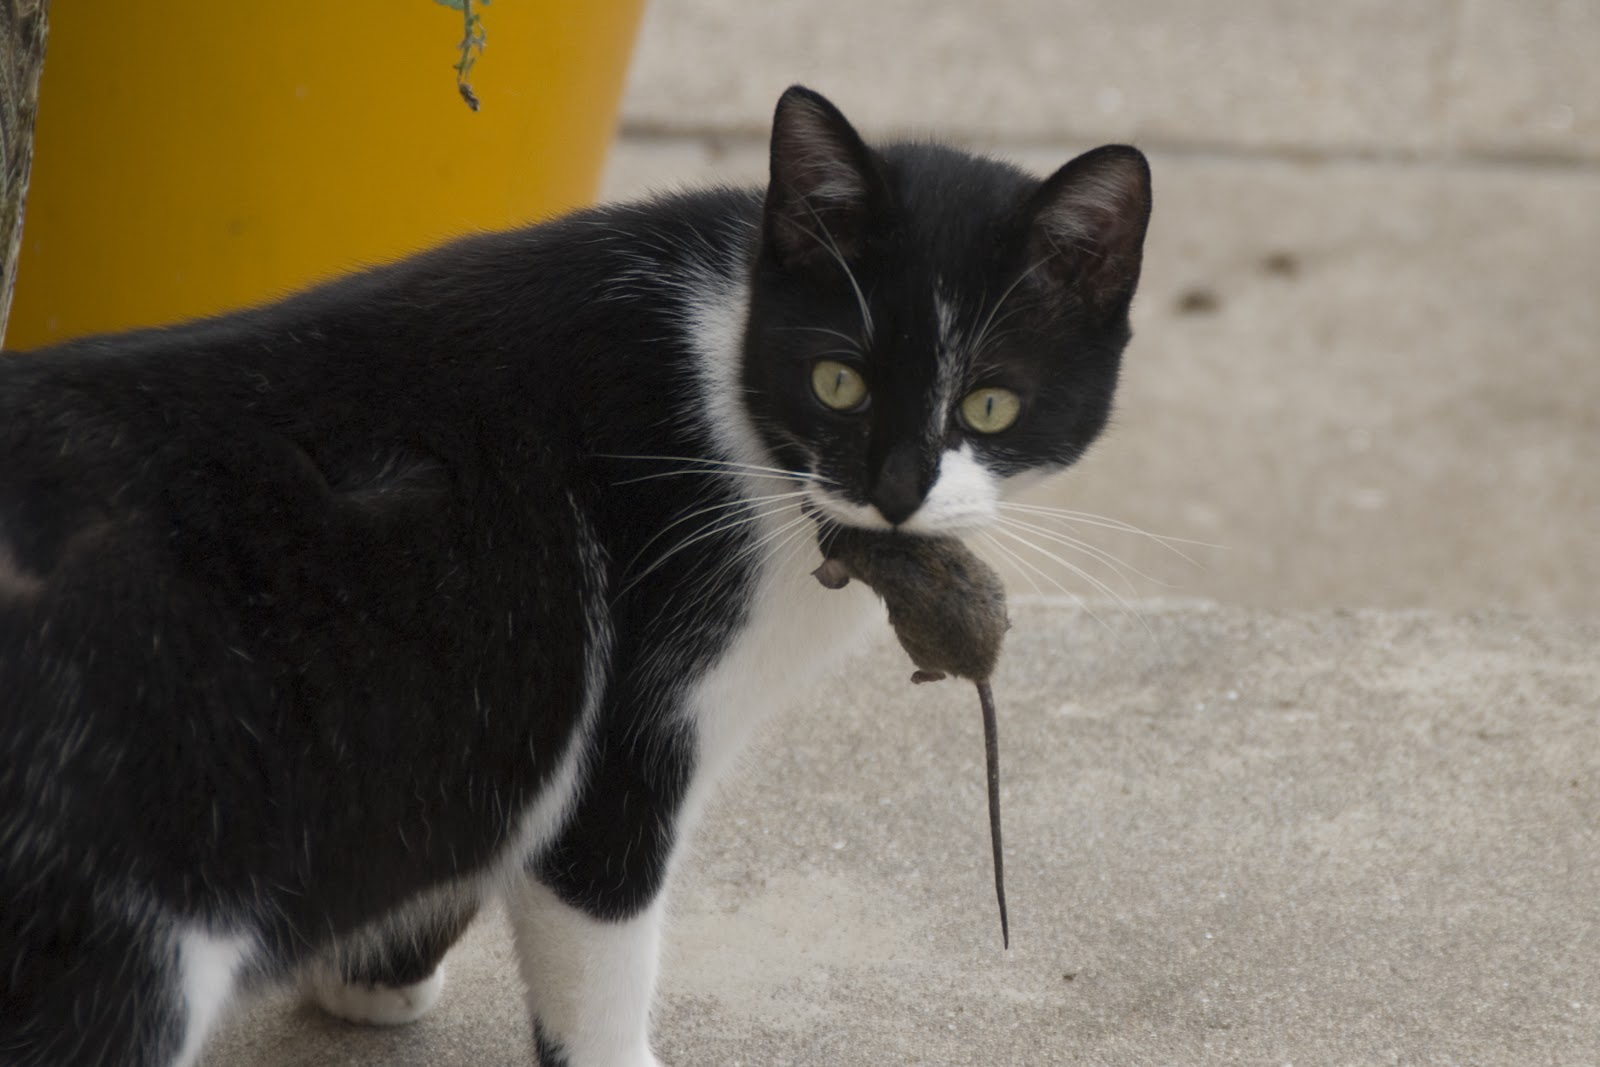 Ribadalagoa: Gato con guantes no caza ratones.